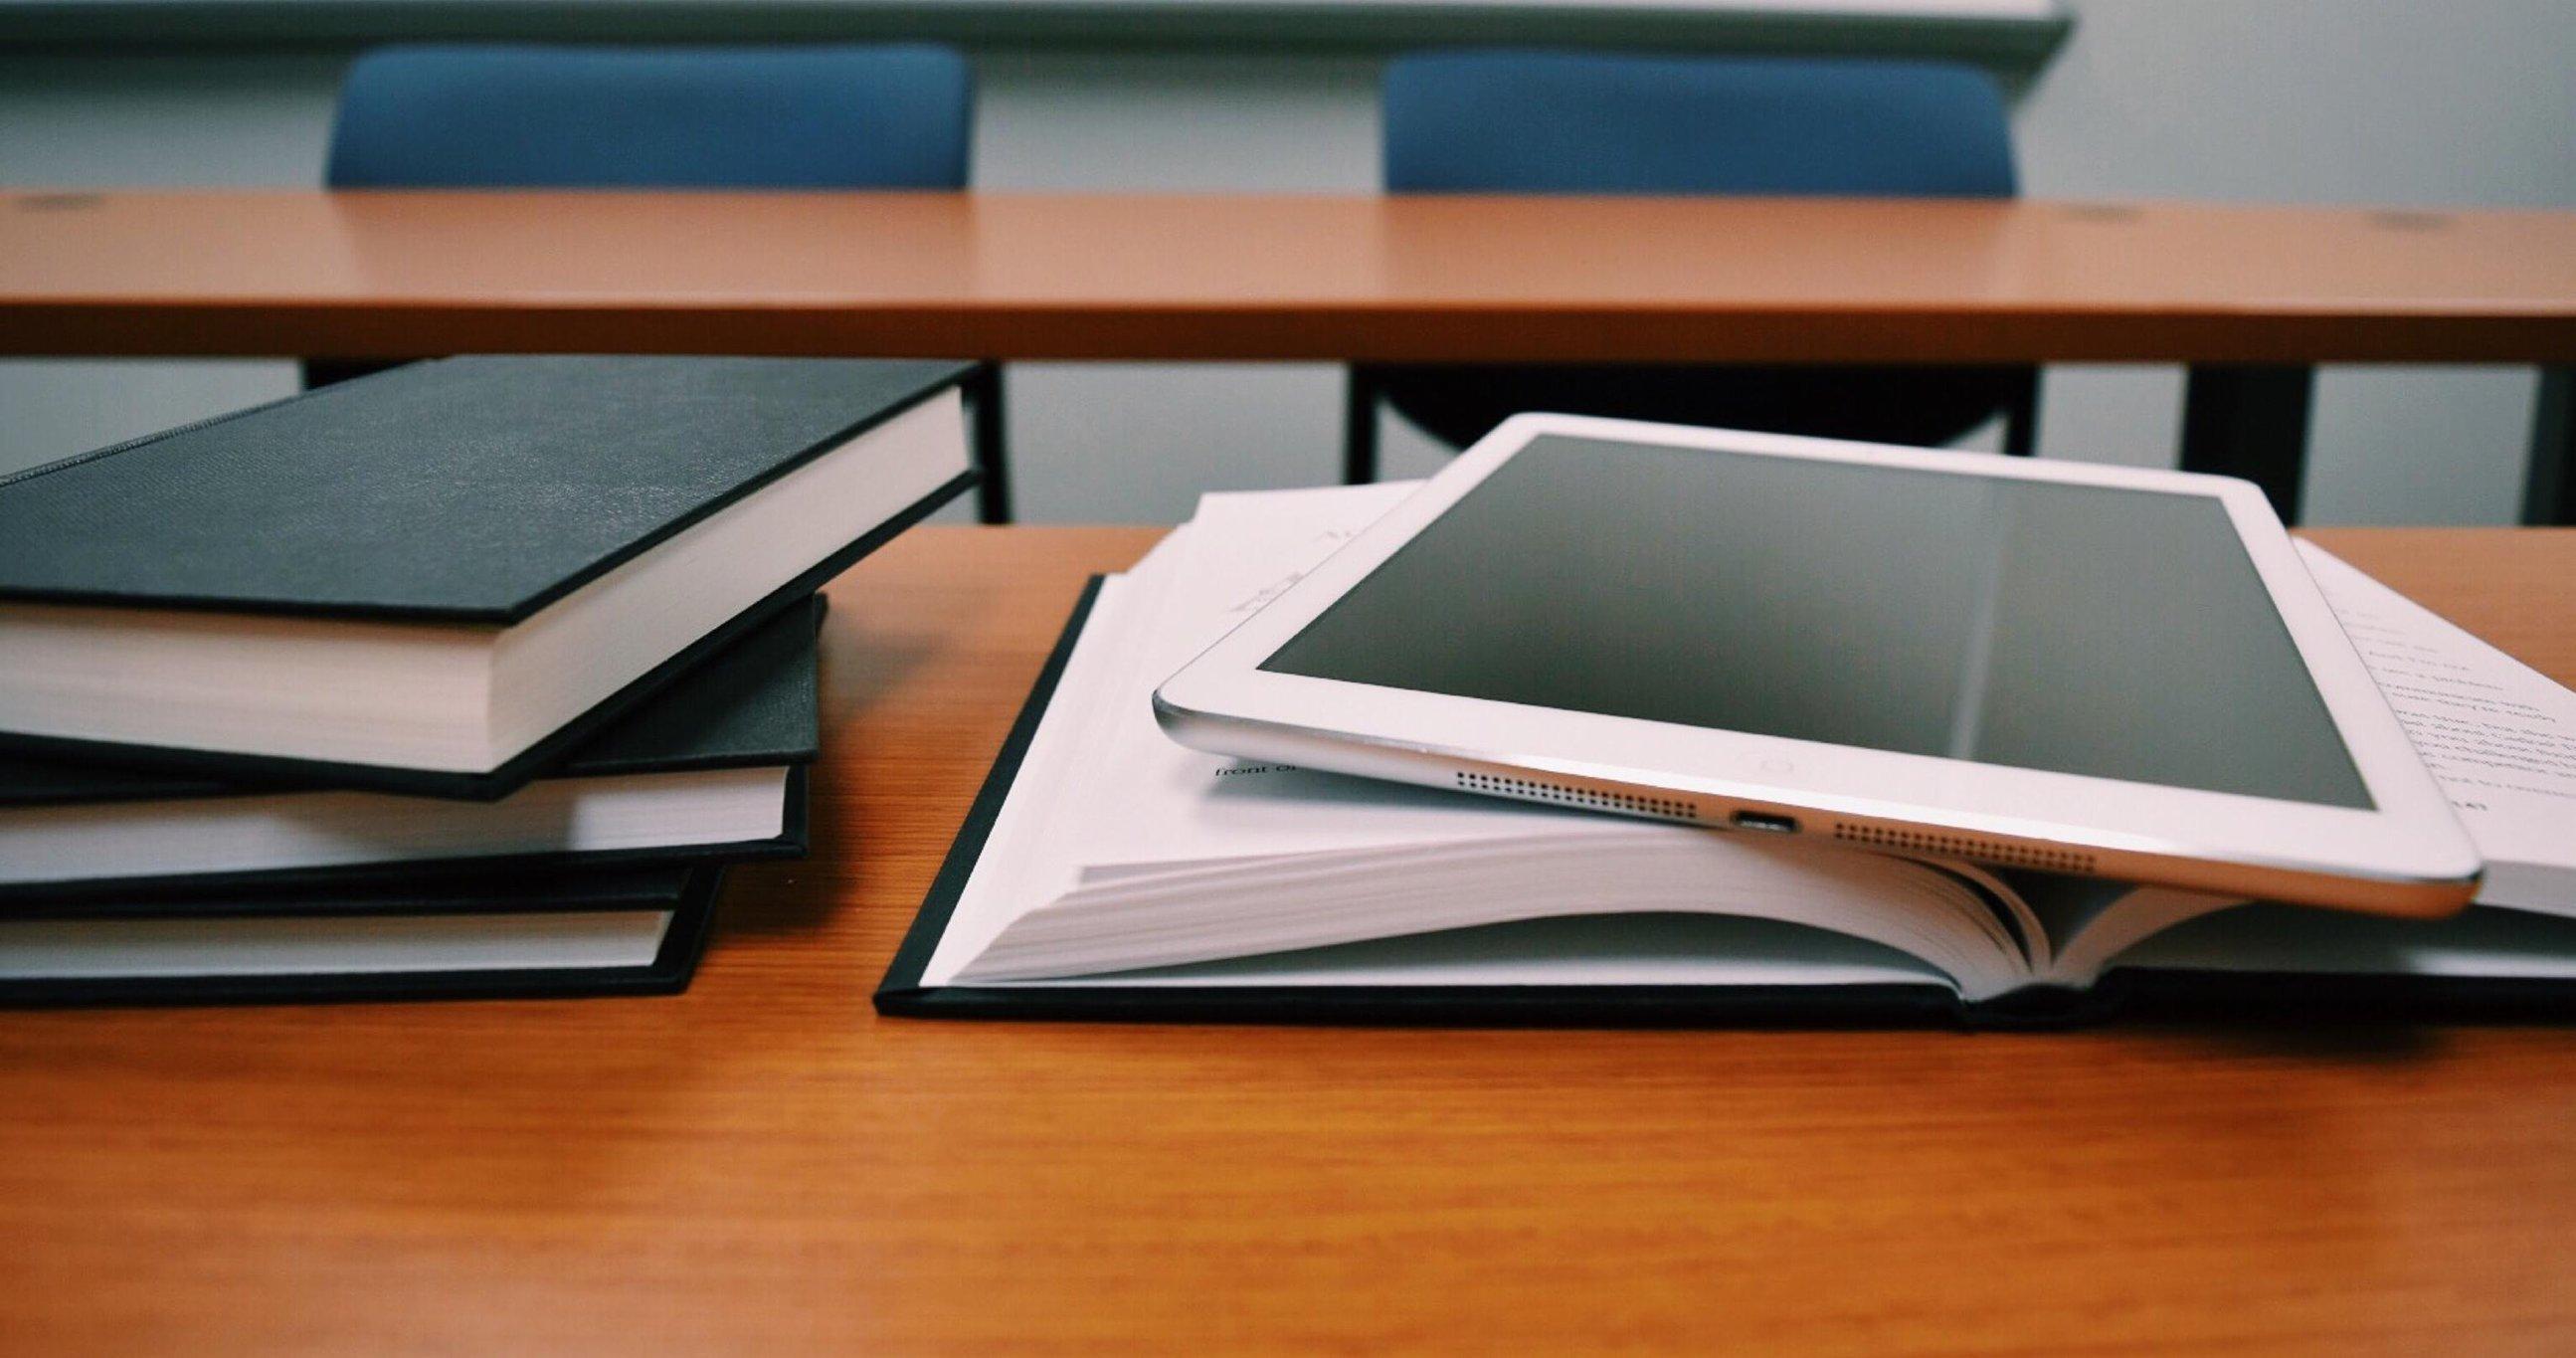 Digital publishing companies need a new business model 2